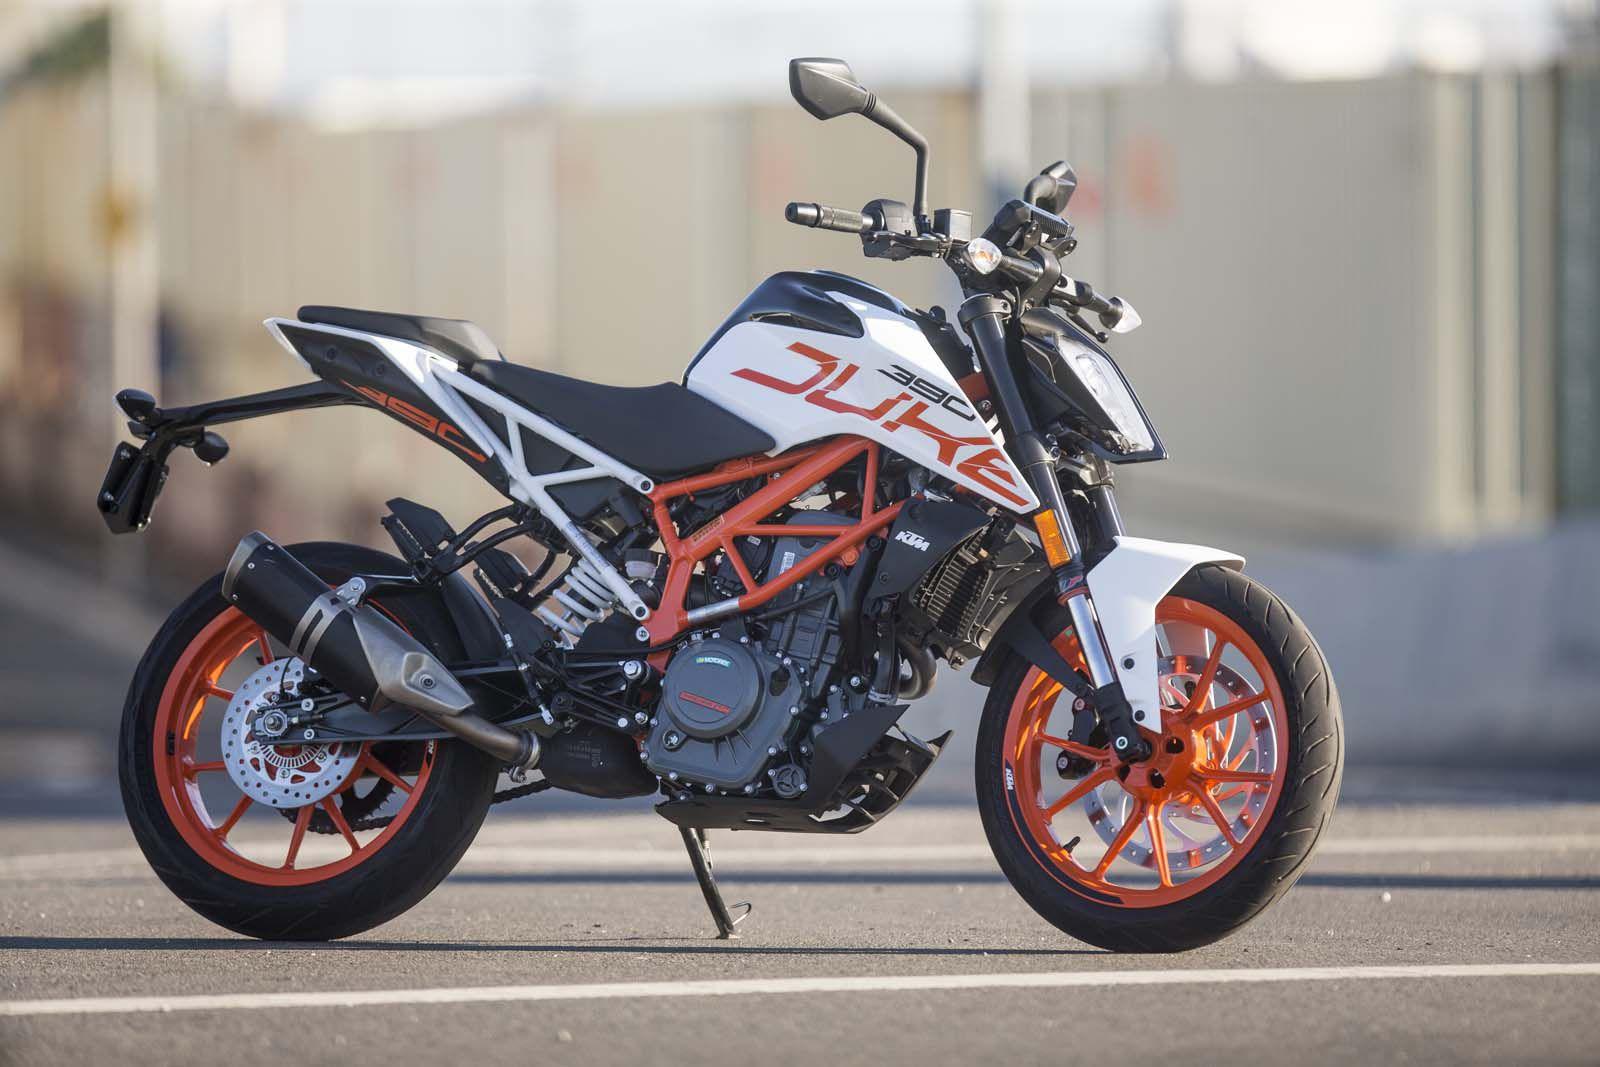 2018 Ktm 390 Duke Review Motorcyclist